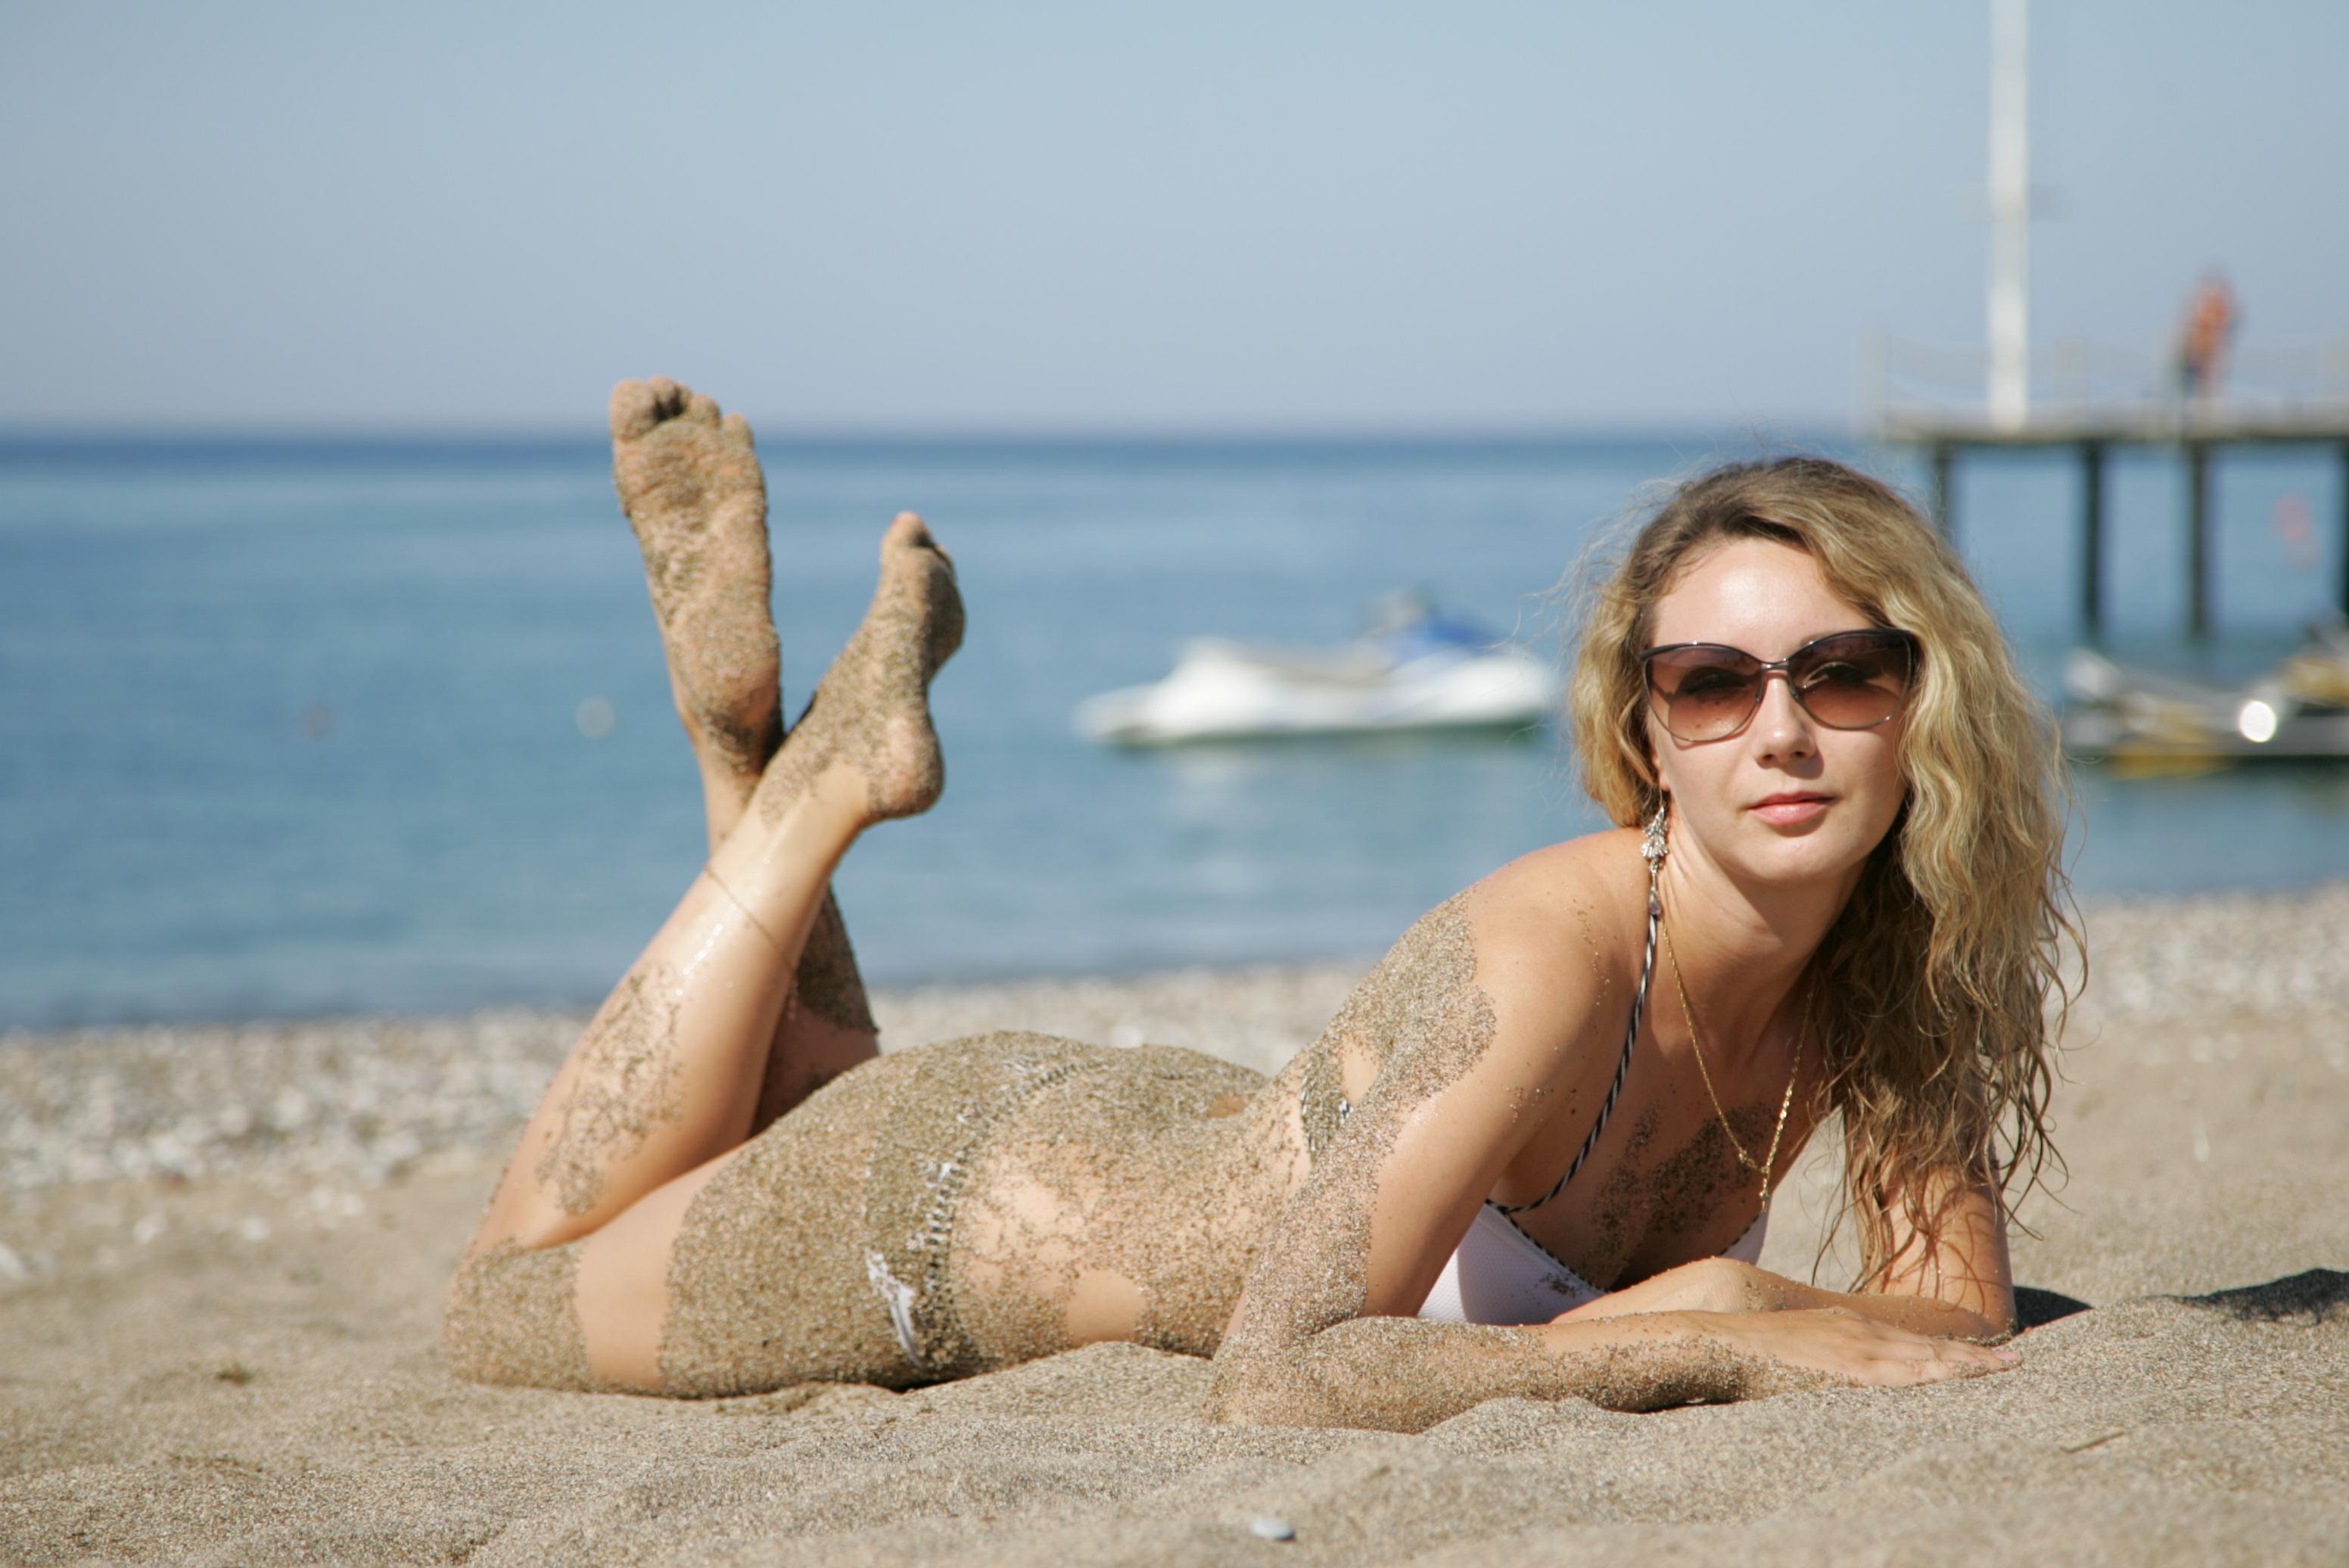 sea summer portrait woman sexy feet beach girl beautiful beauty face  sunglasses lady model legs dream